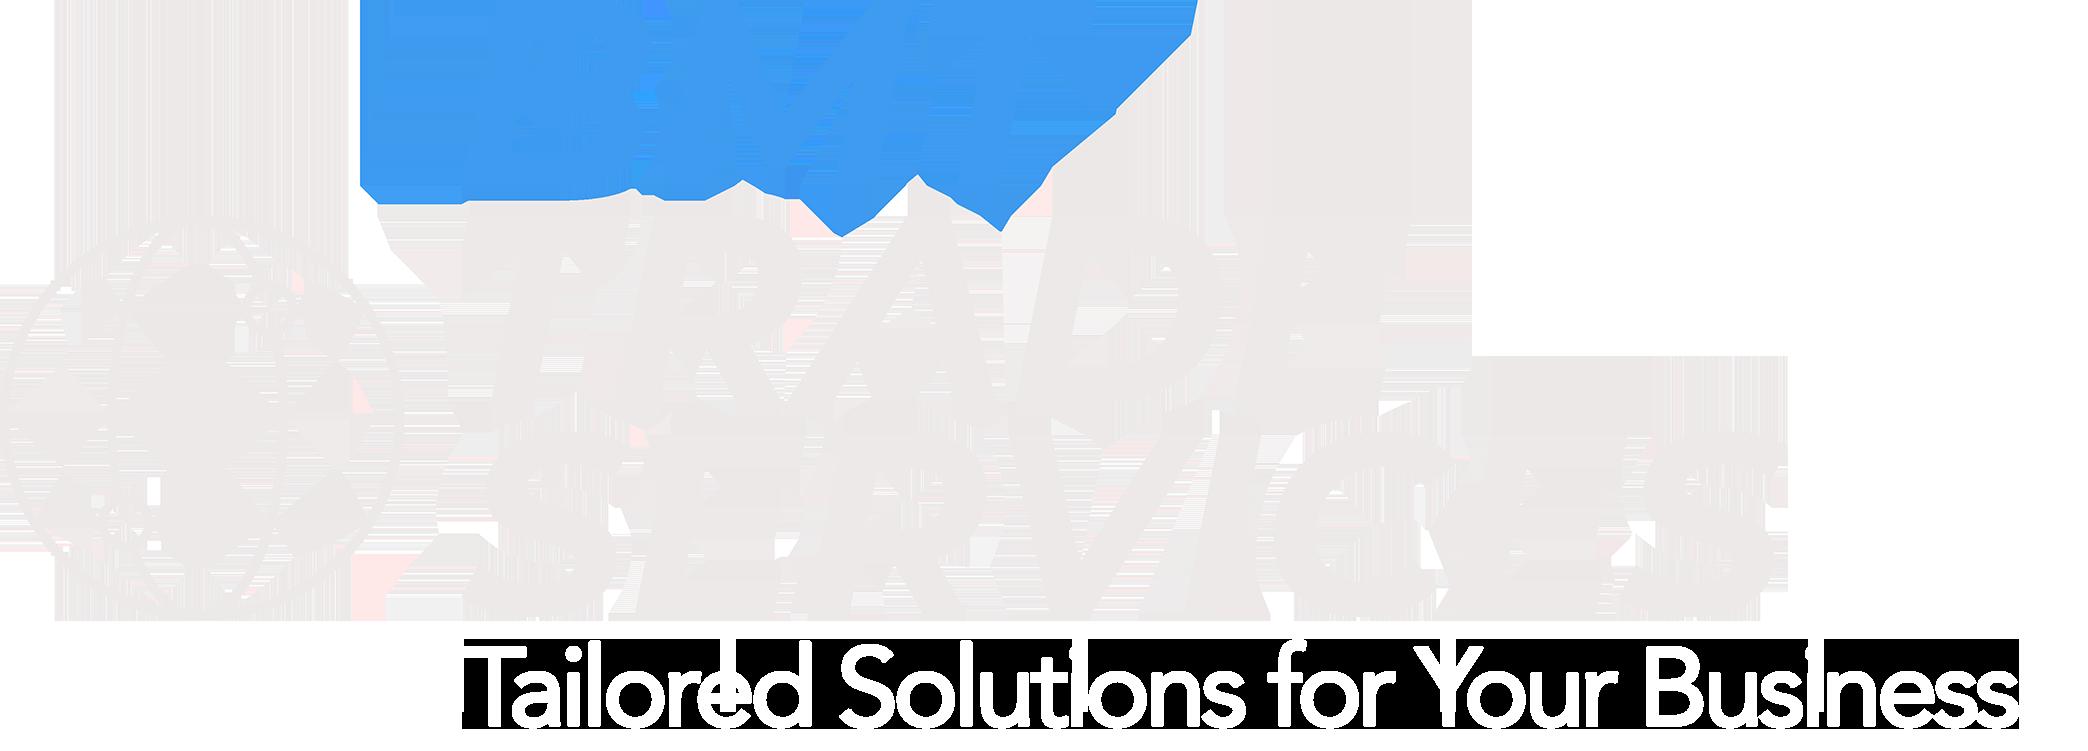 BMT Trade Services